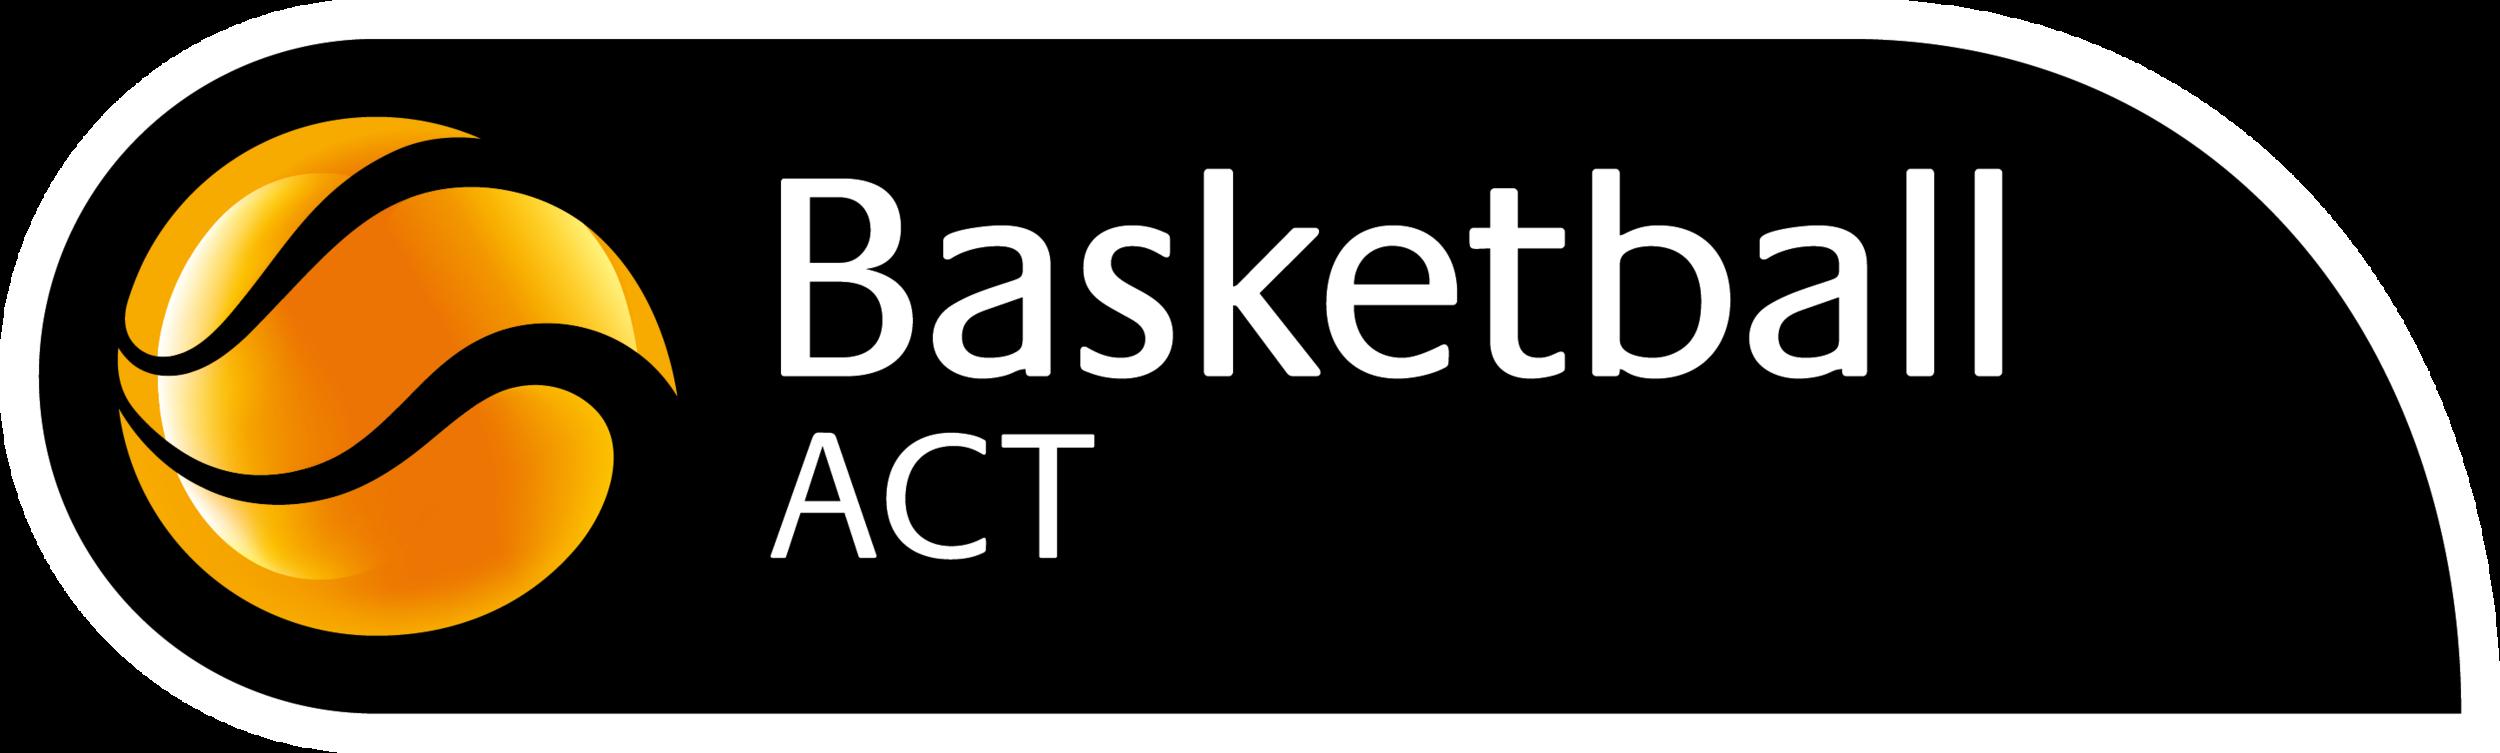 Basketball ACT.png